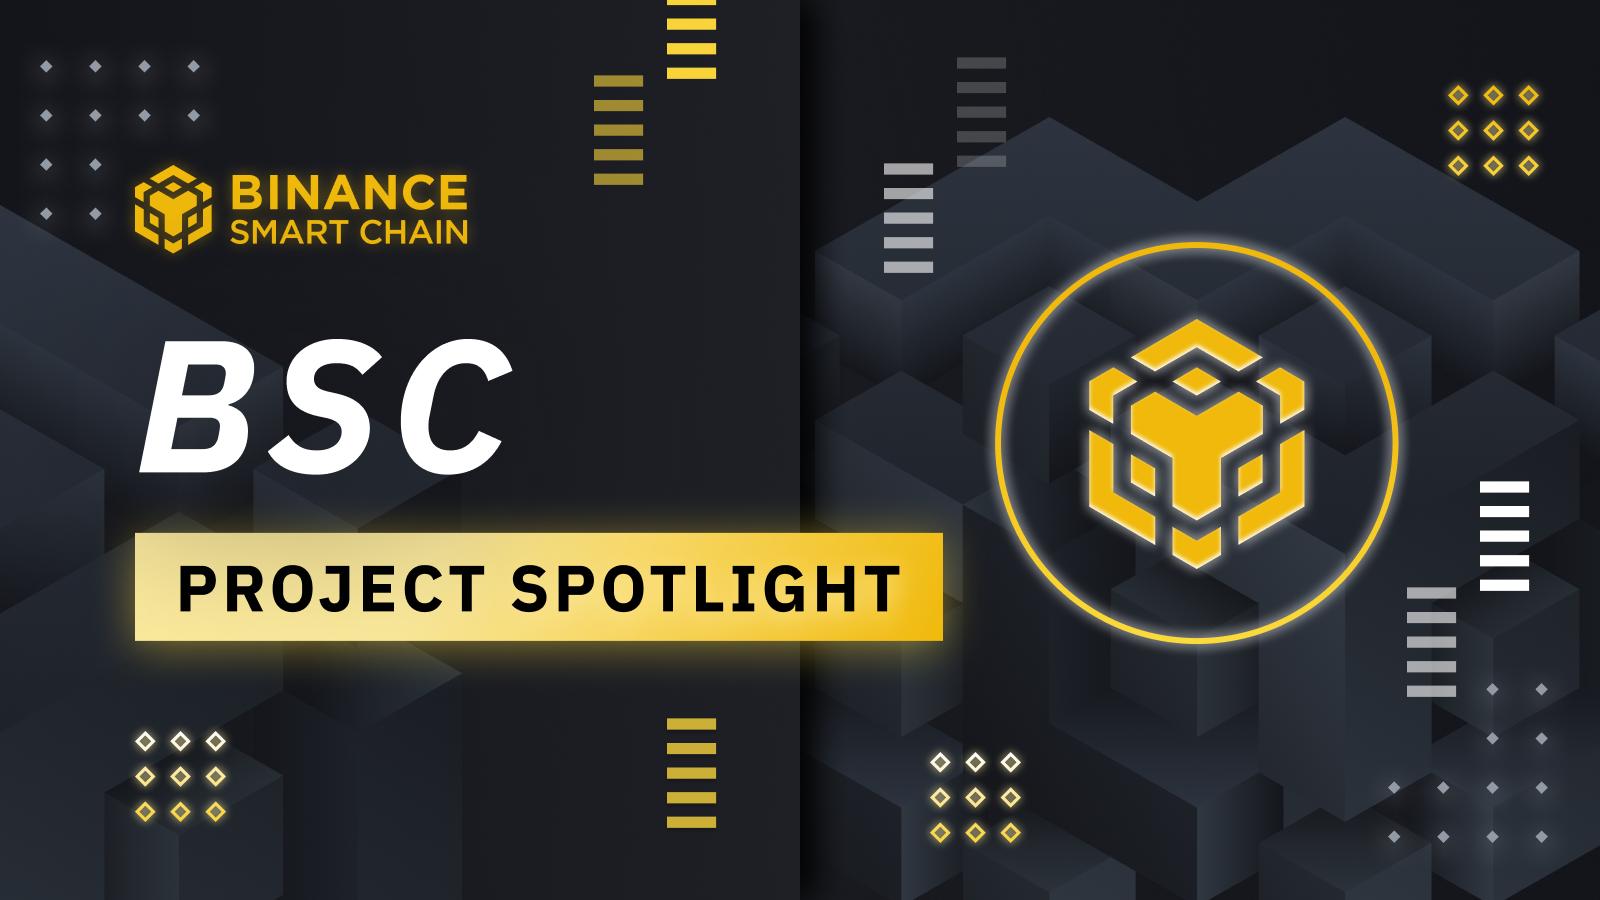 BSC Project Spotlight: X World Games